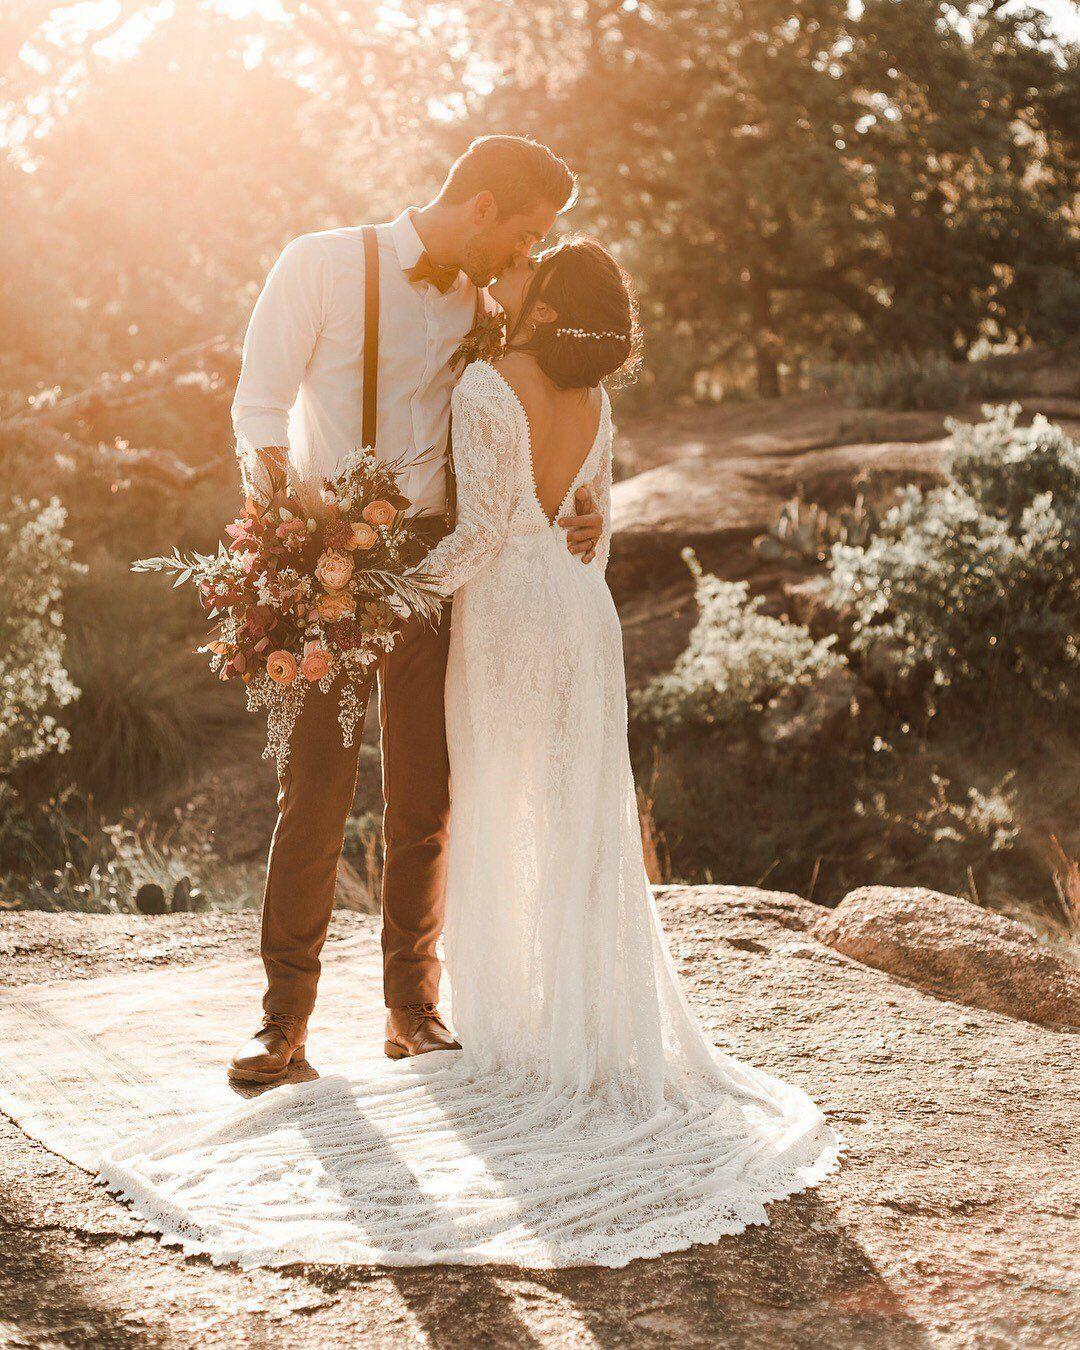 Photo of Venice Bohemian Wedding Dress Vintage Lace Wedding Dress Long Sleeves and Open Back Wedding Dress